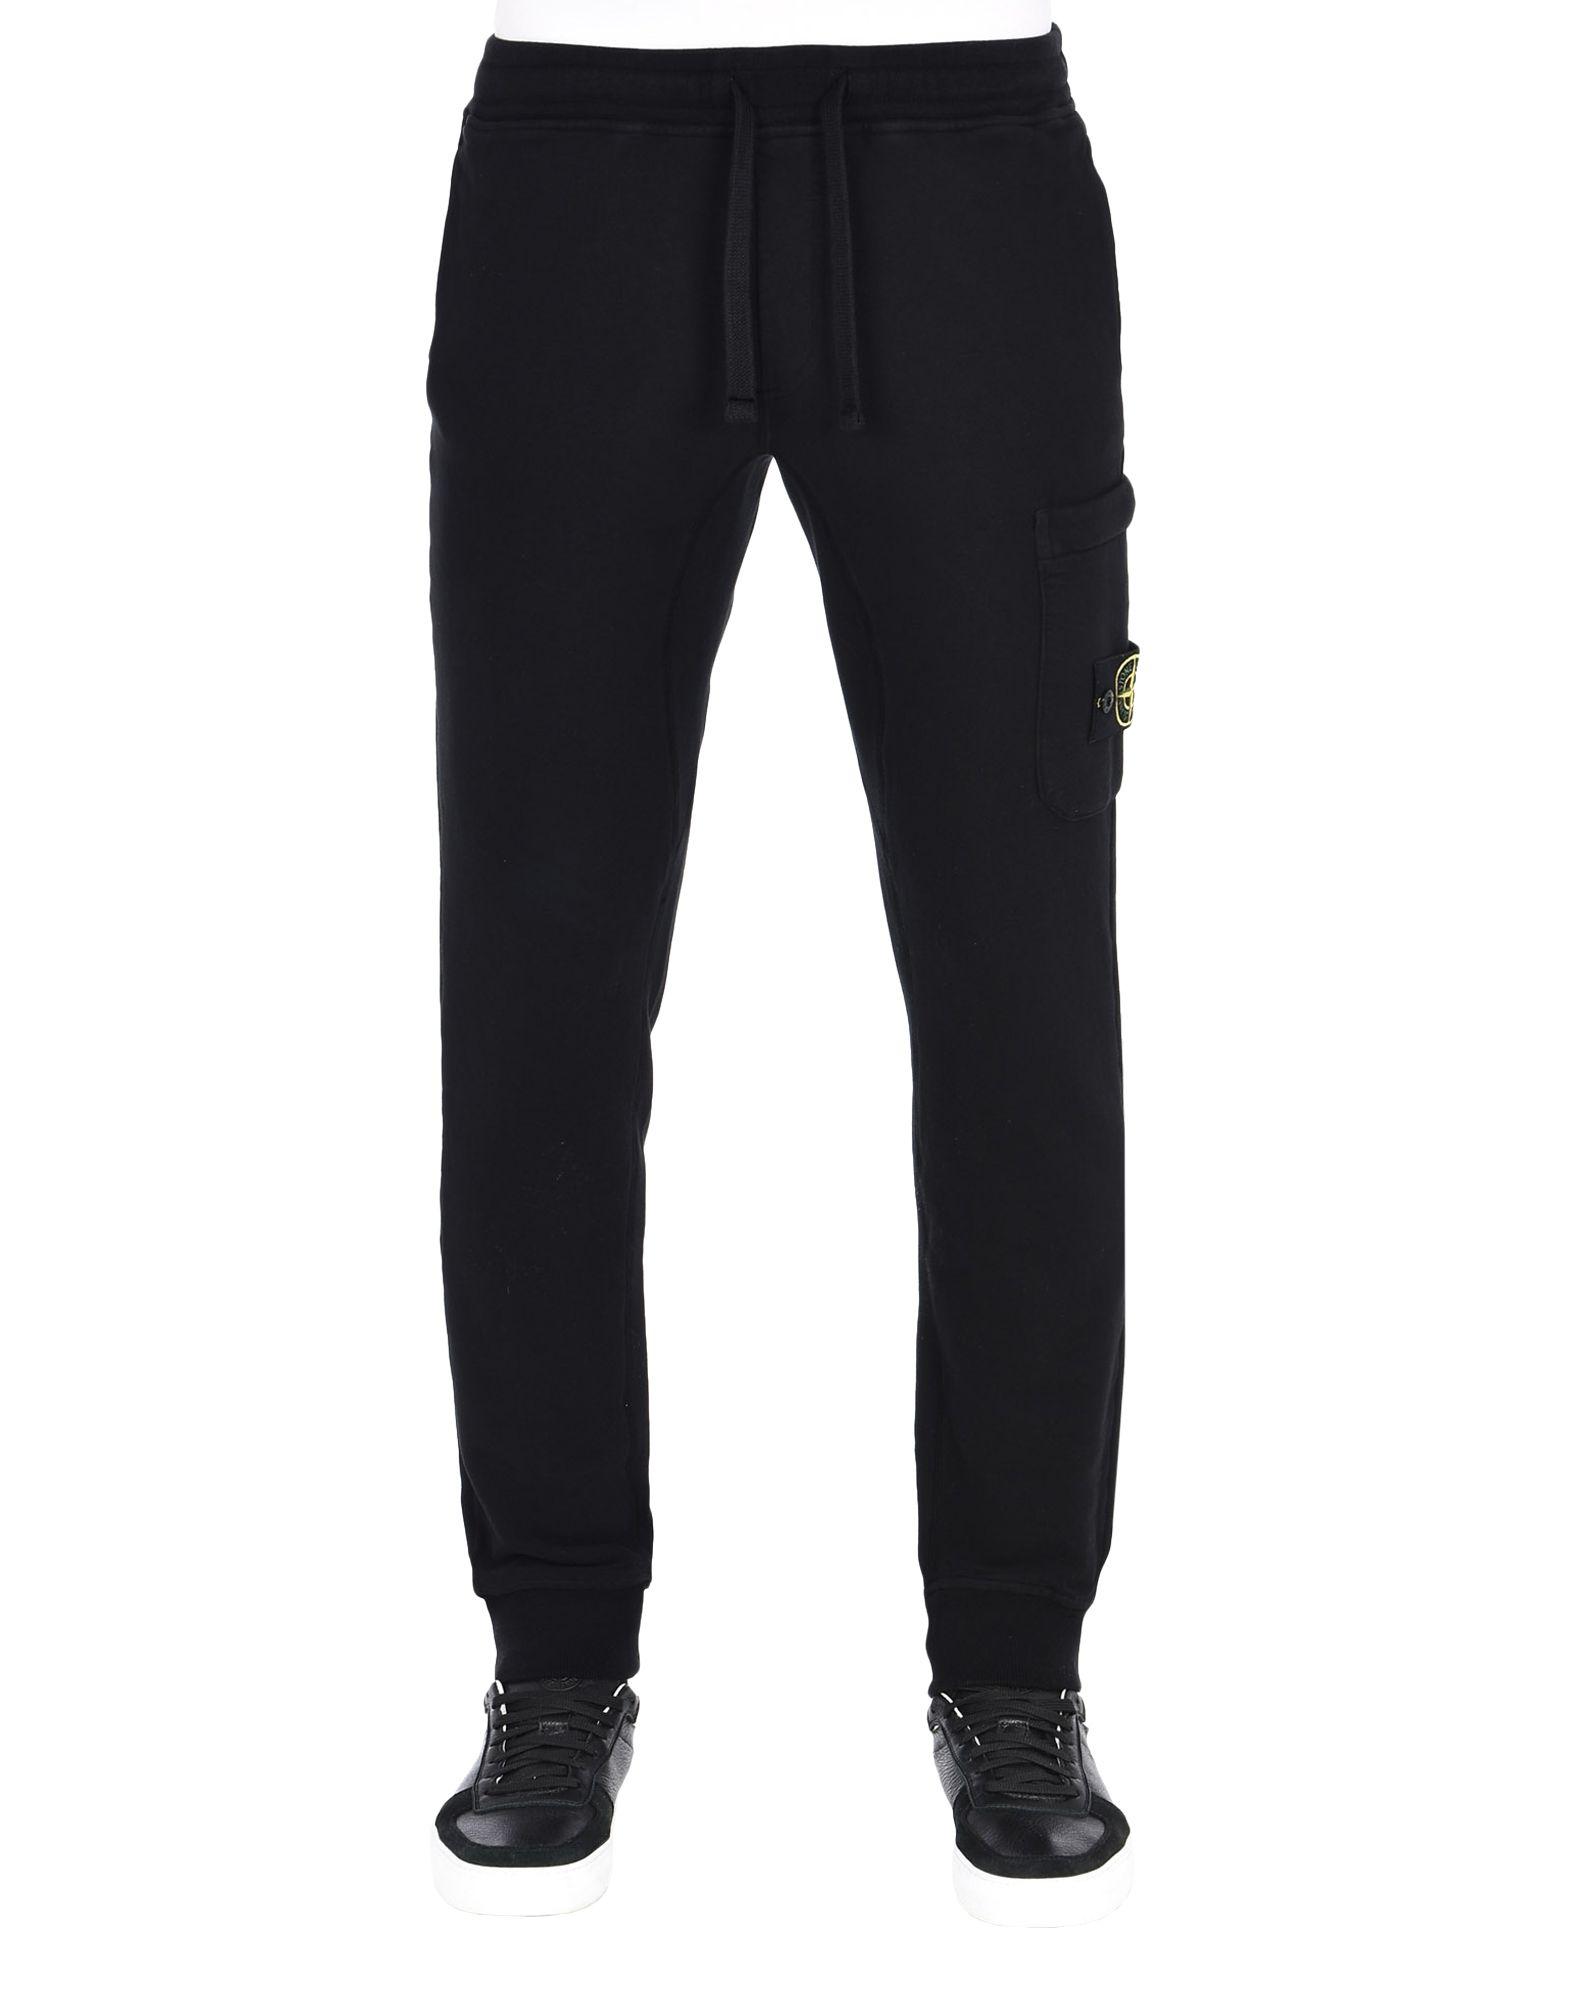 18FW 60320 JOGGER StoneStore 卫裤